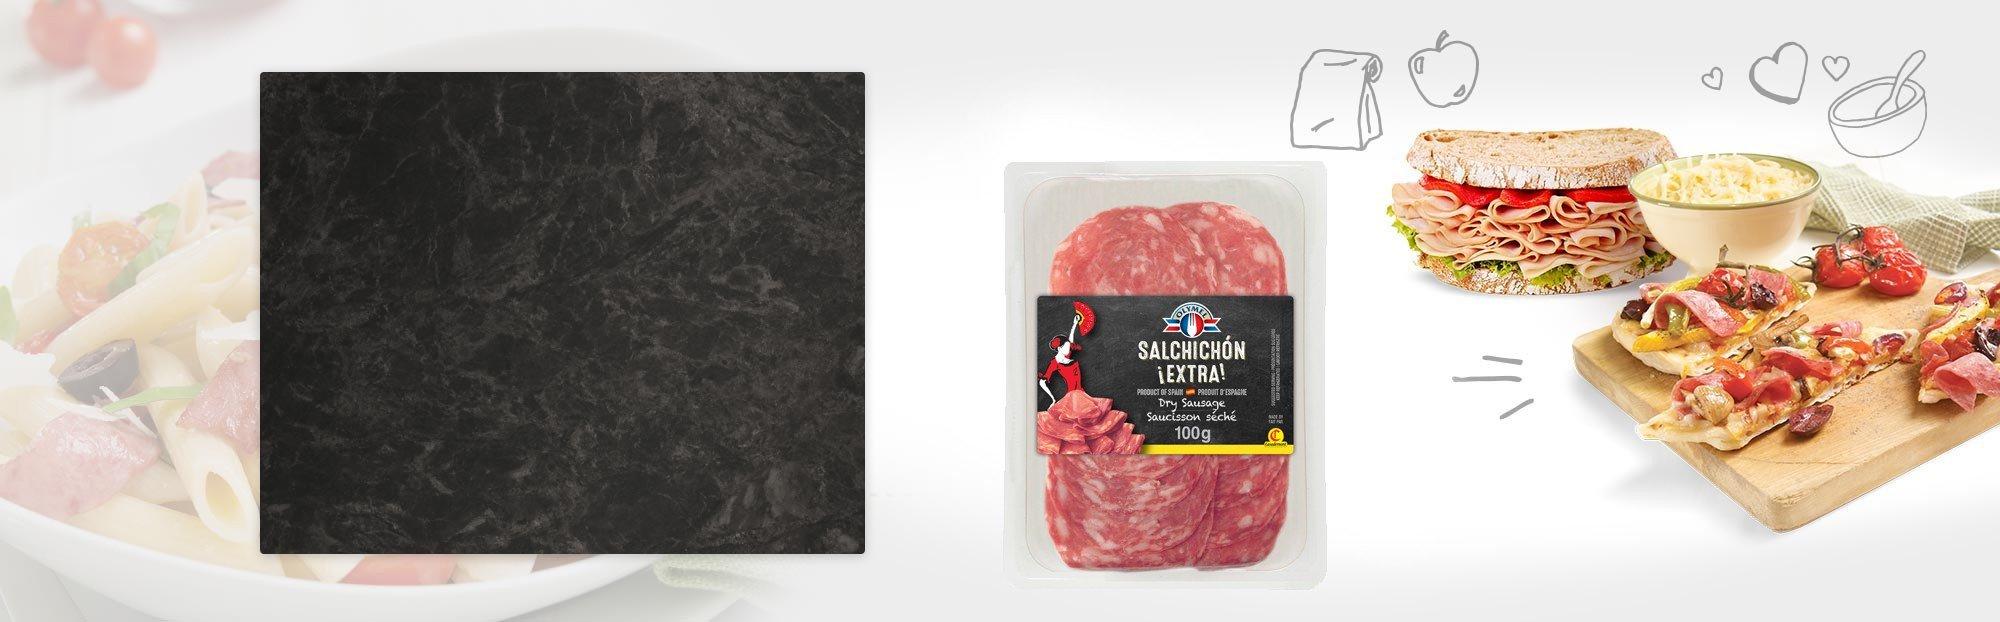 Salchichon Extra dry sausage